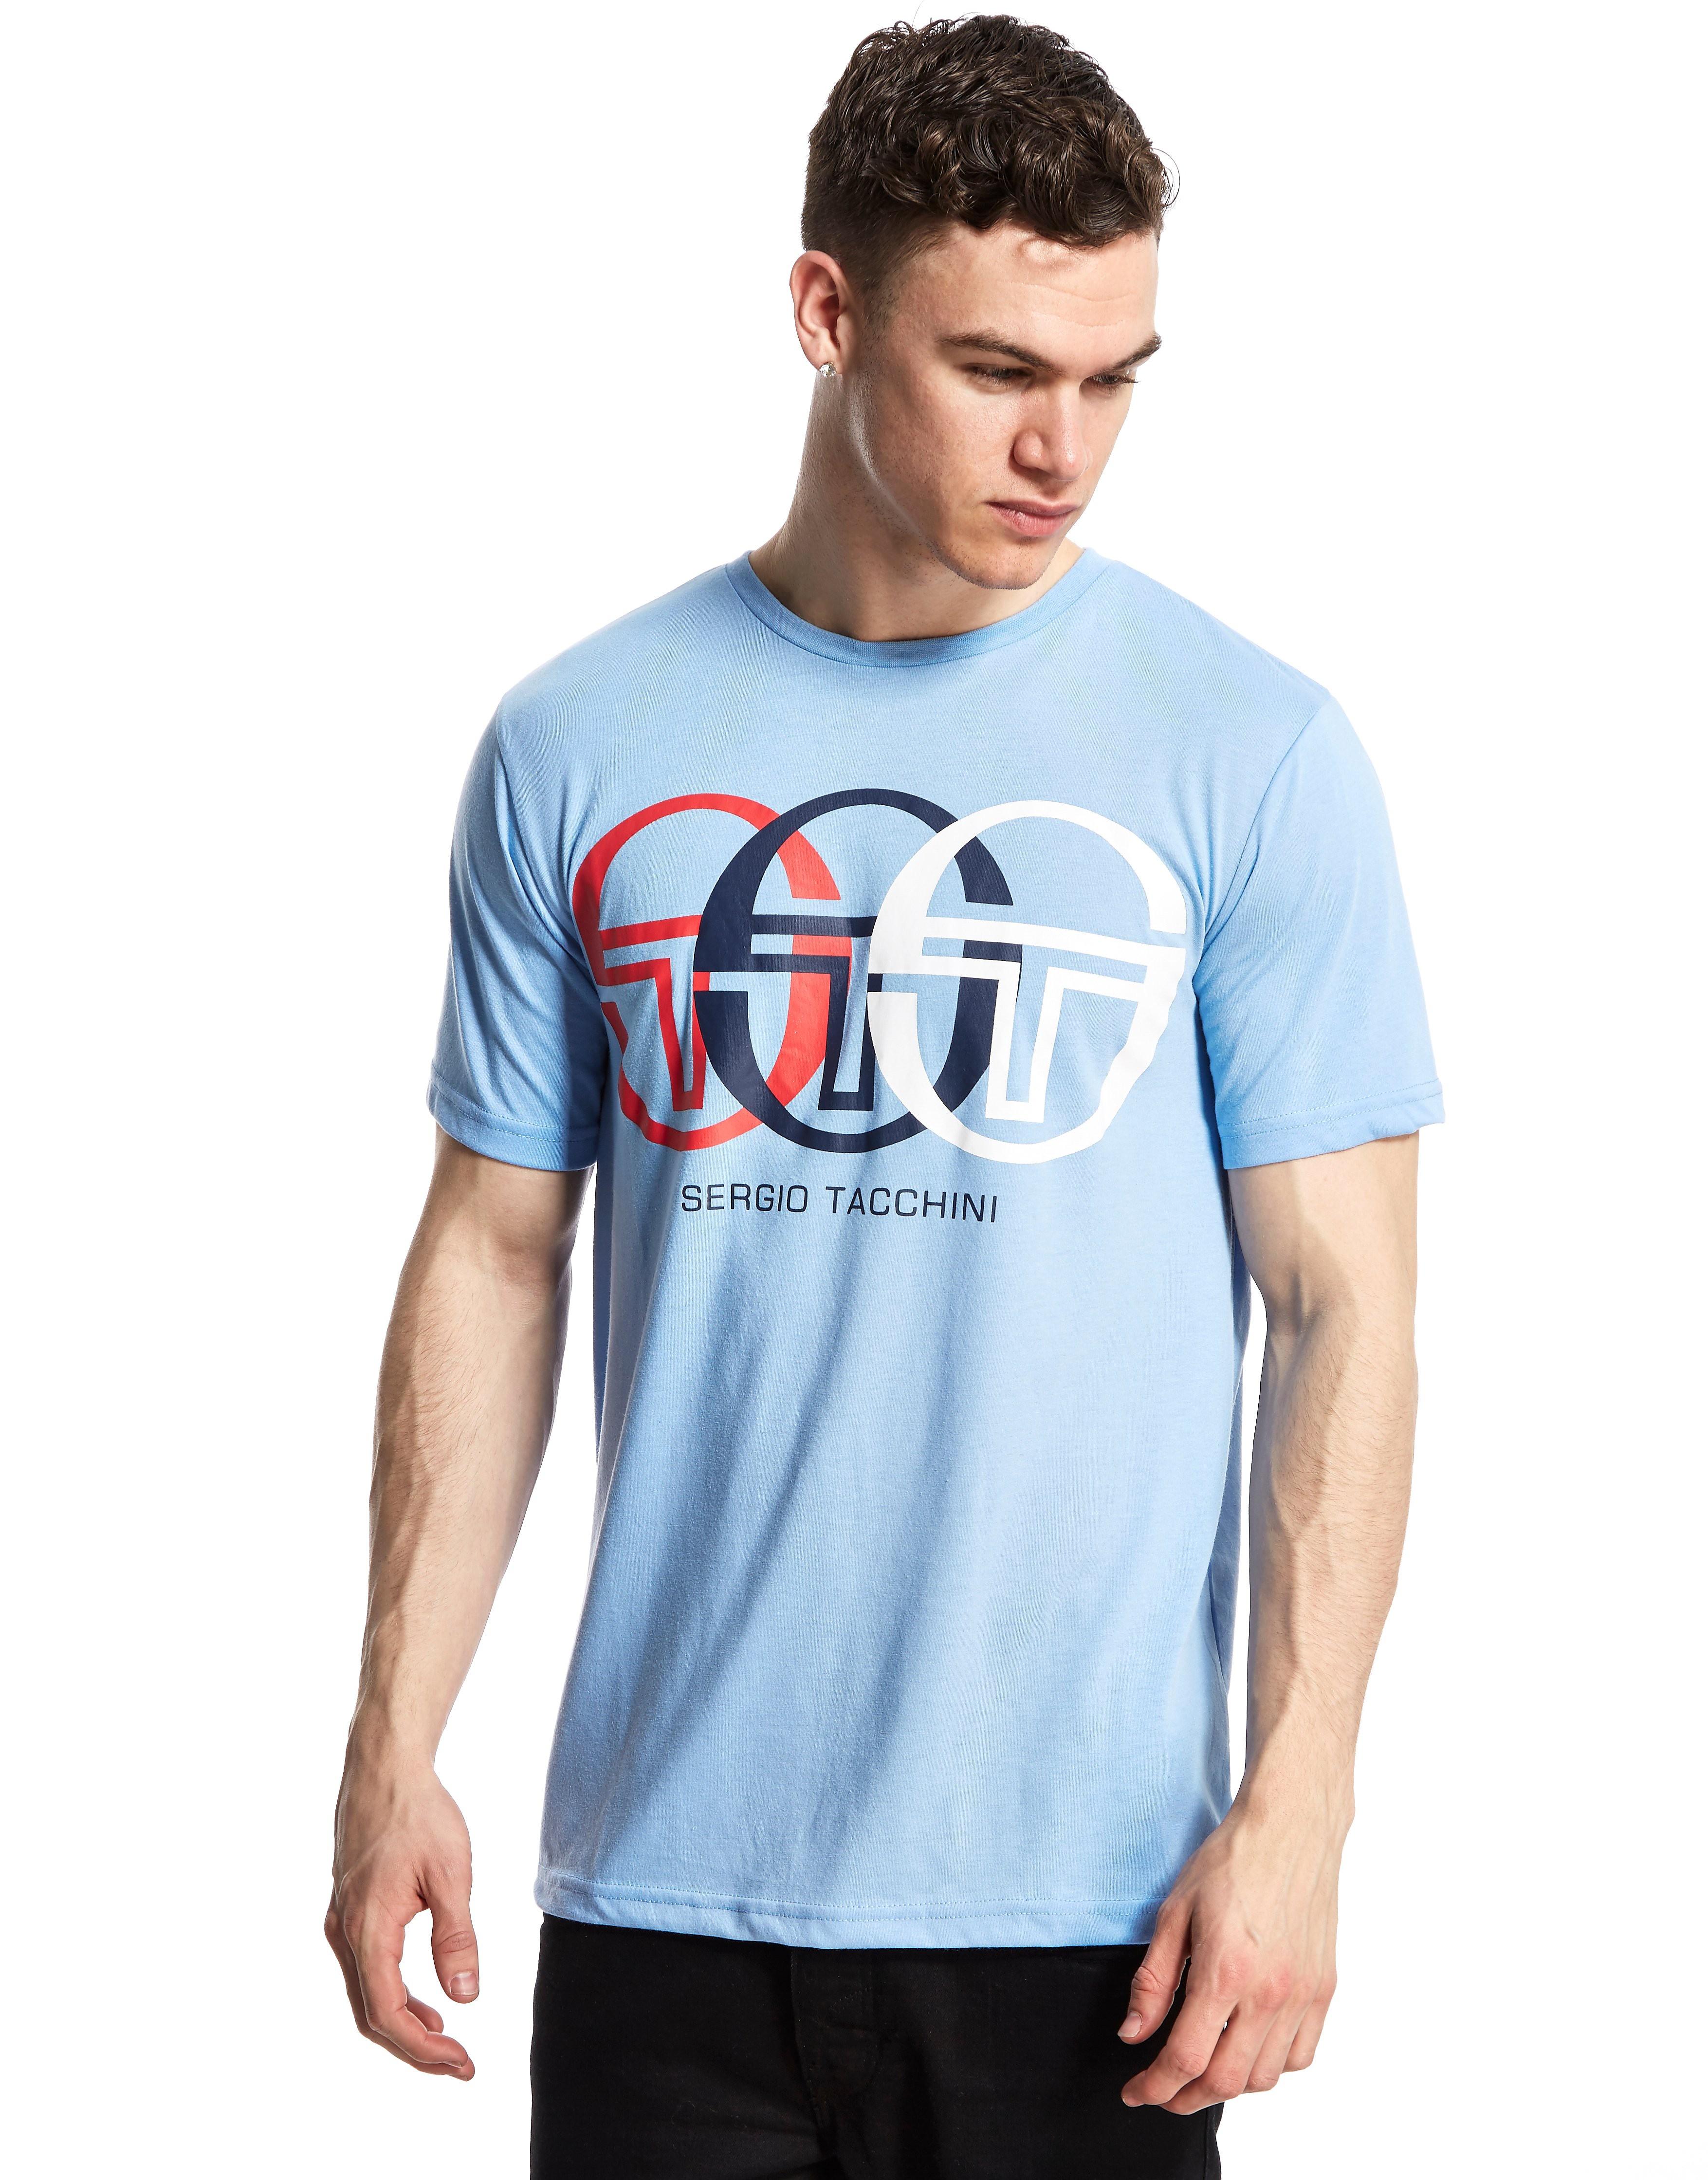 Sergio Tacchini Lugano T-Shirt